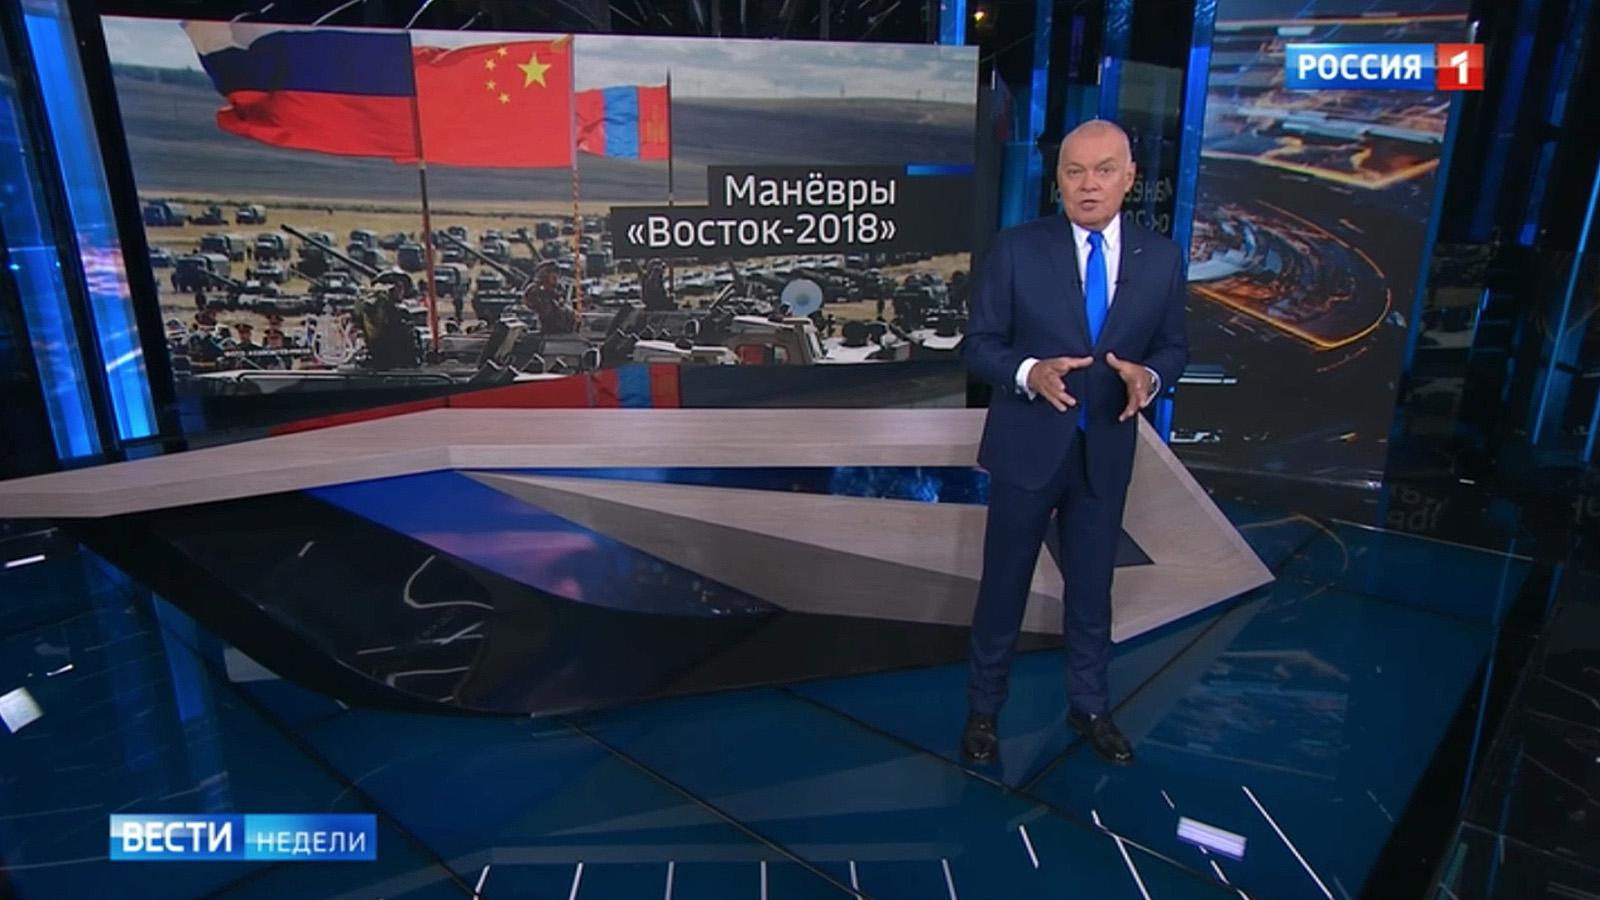 NCS_Russia-1-Vesti-Studio_0009